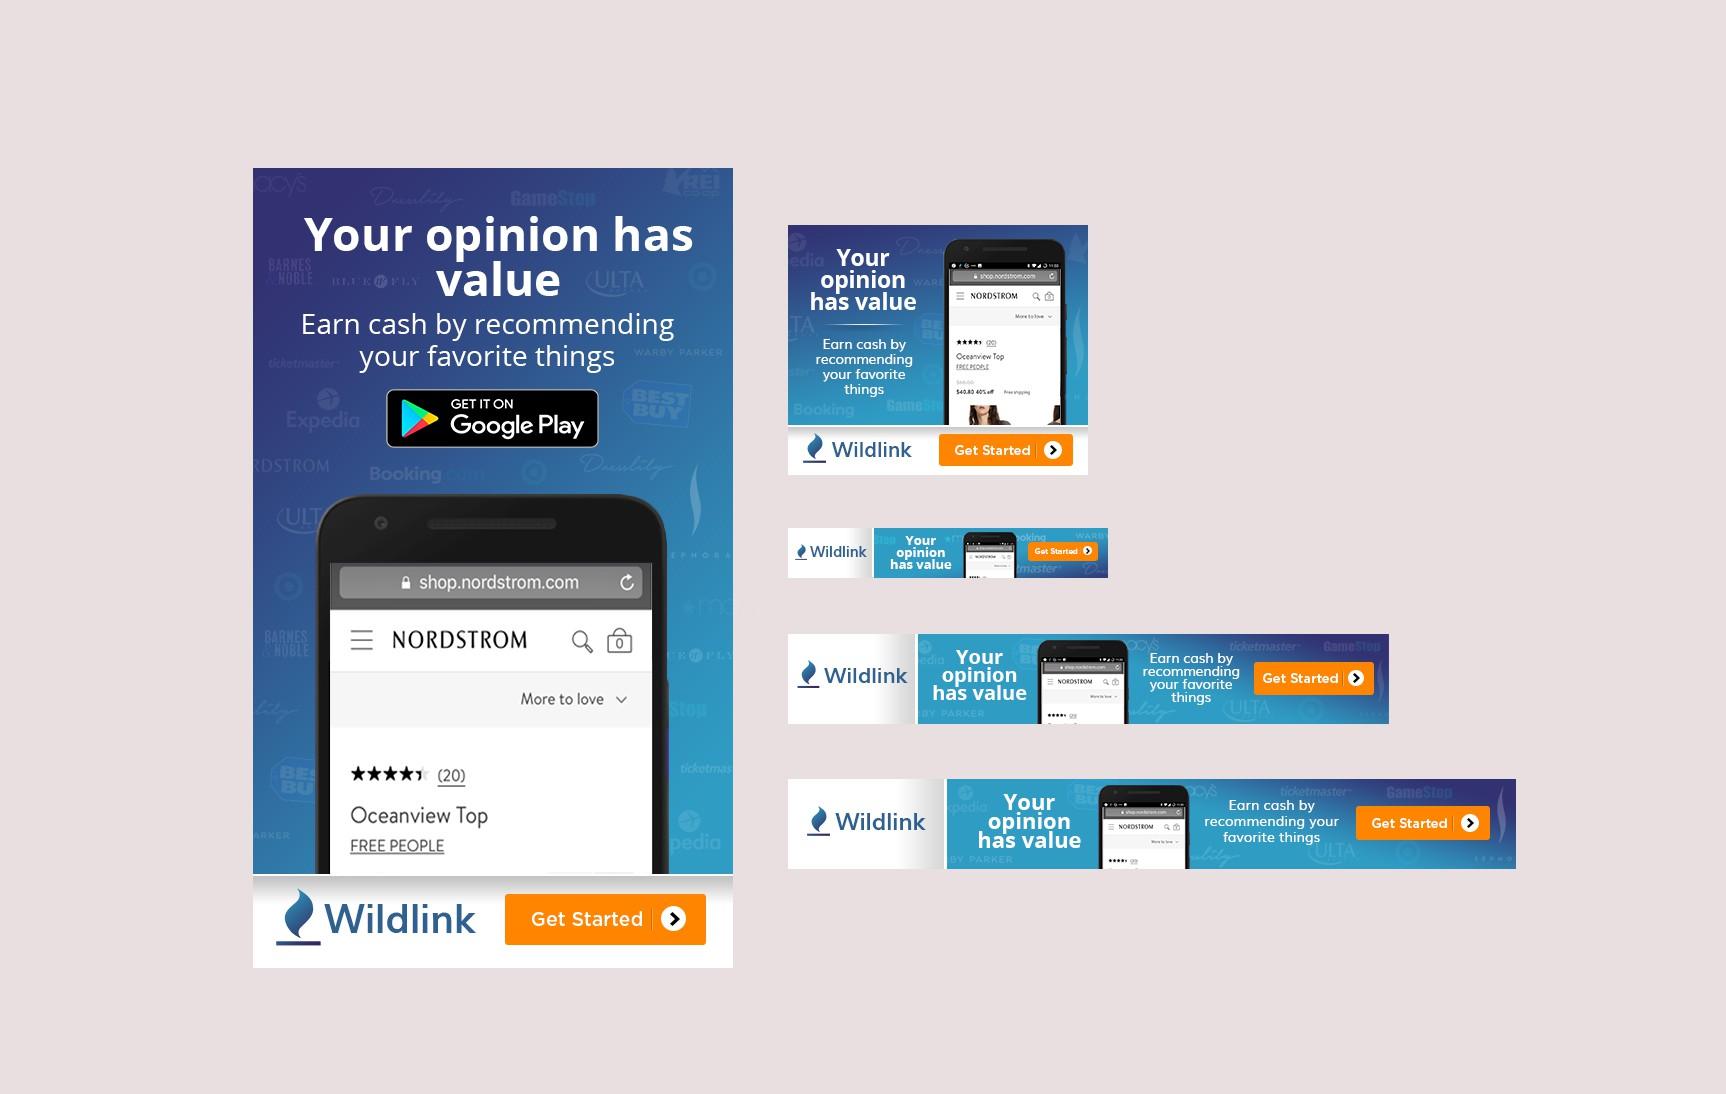 Wildlink - 2018 Summer Digital Ad Campaign